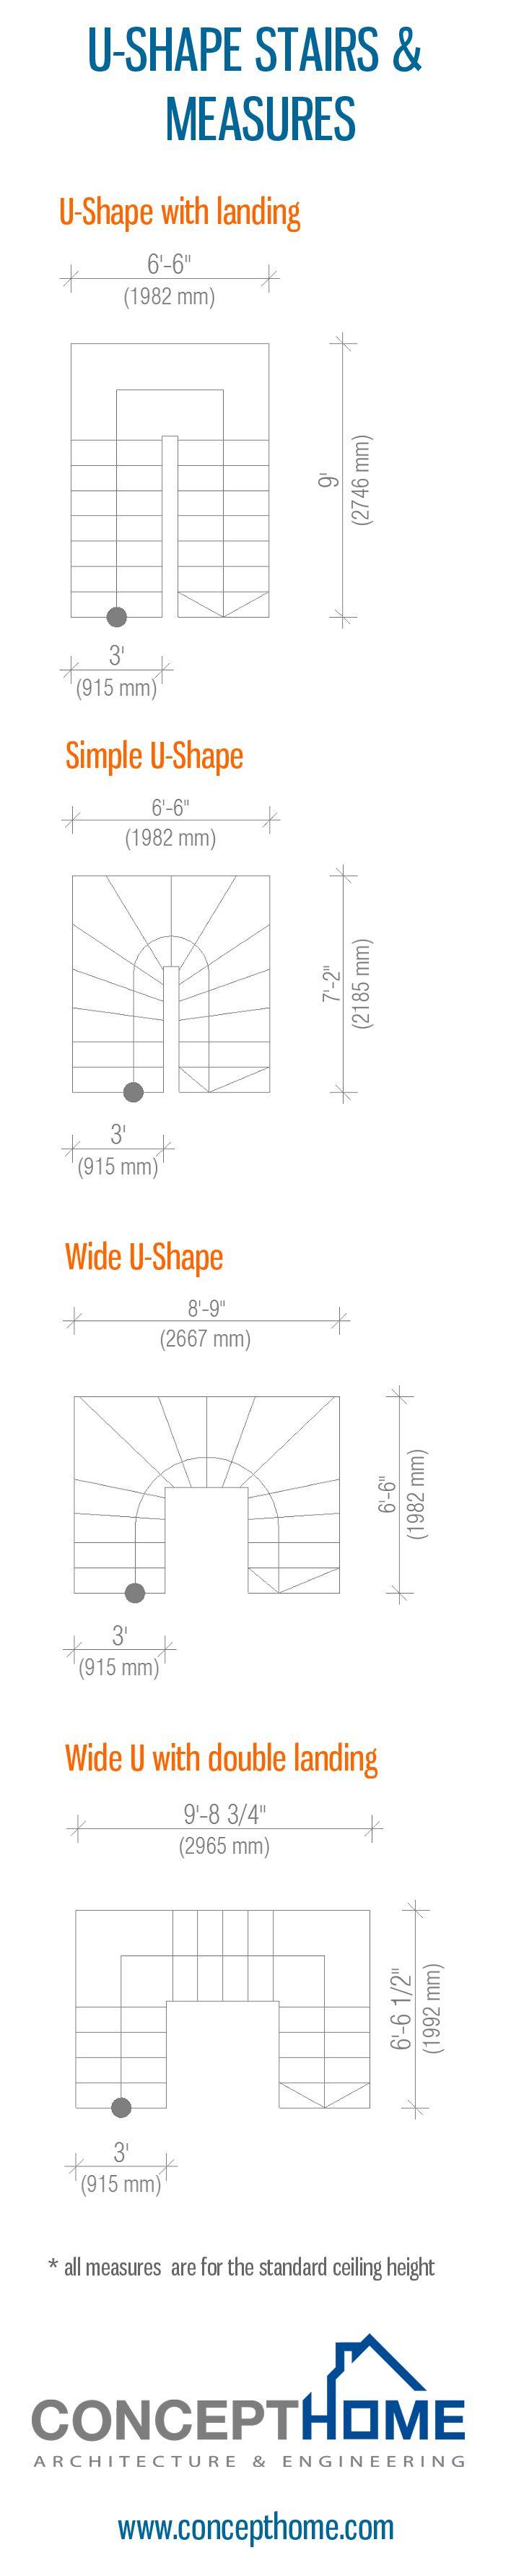 new-designs-2014_300_U_Shape_stairs.jpg